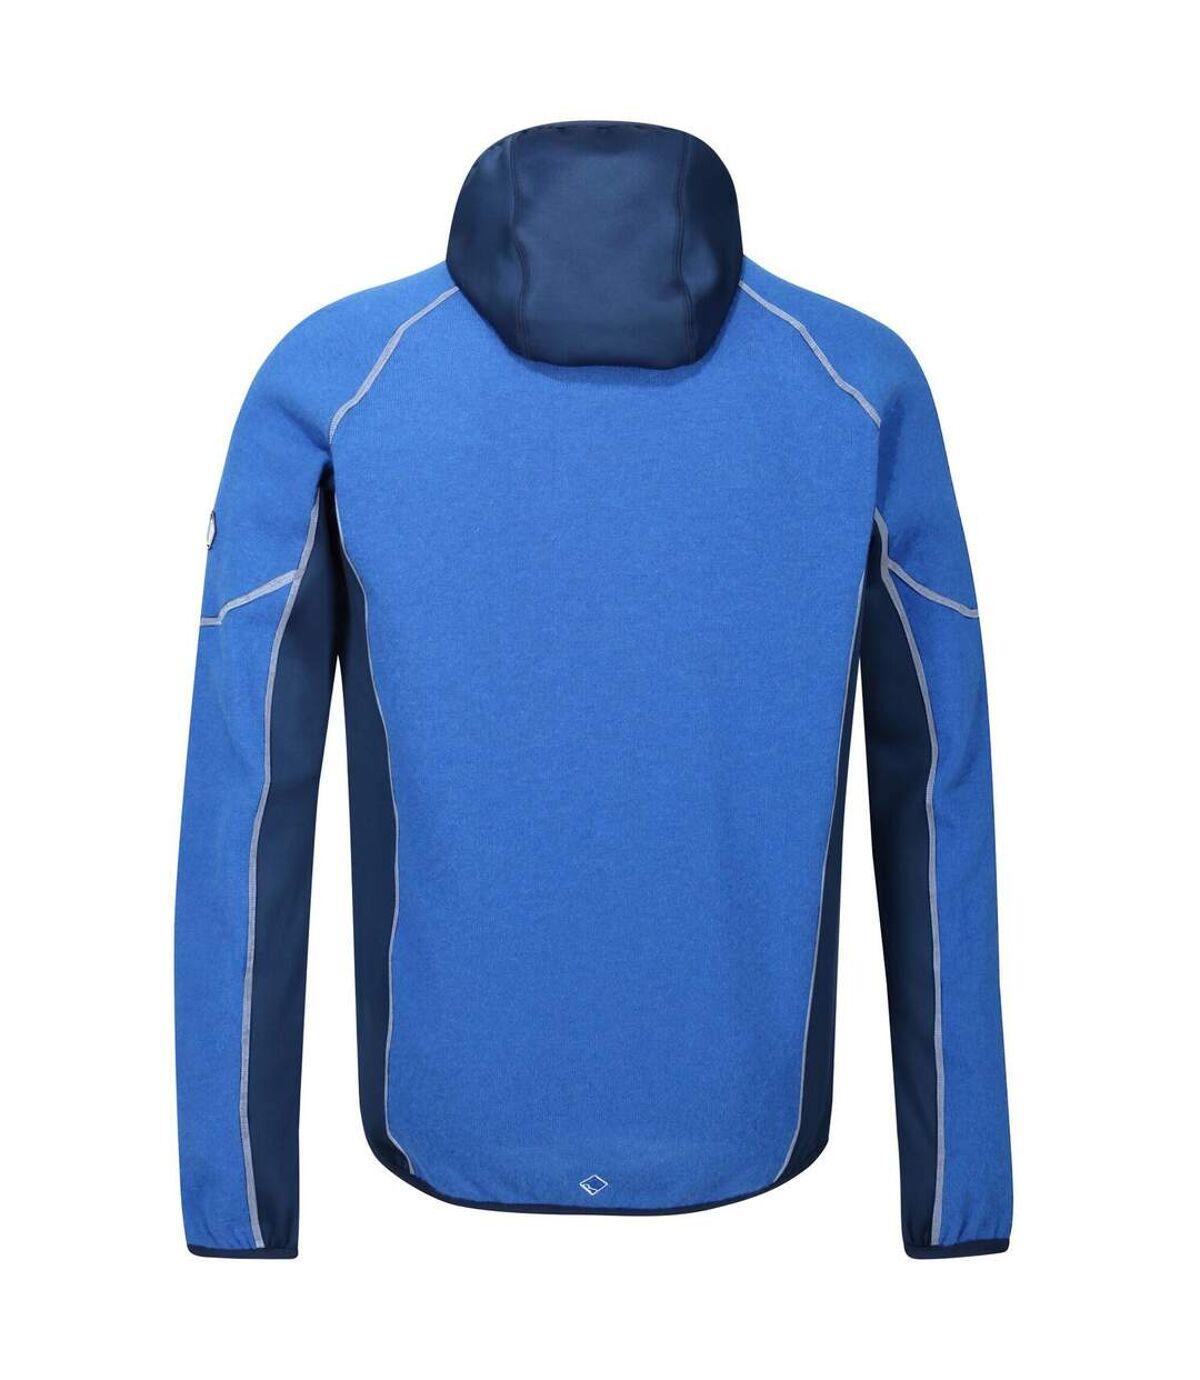 Regatta Mens Kniver Hooded Stretch Fleece (Oxford/Prussian Blue) - UTRG4627